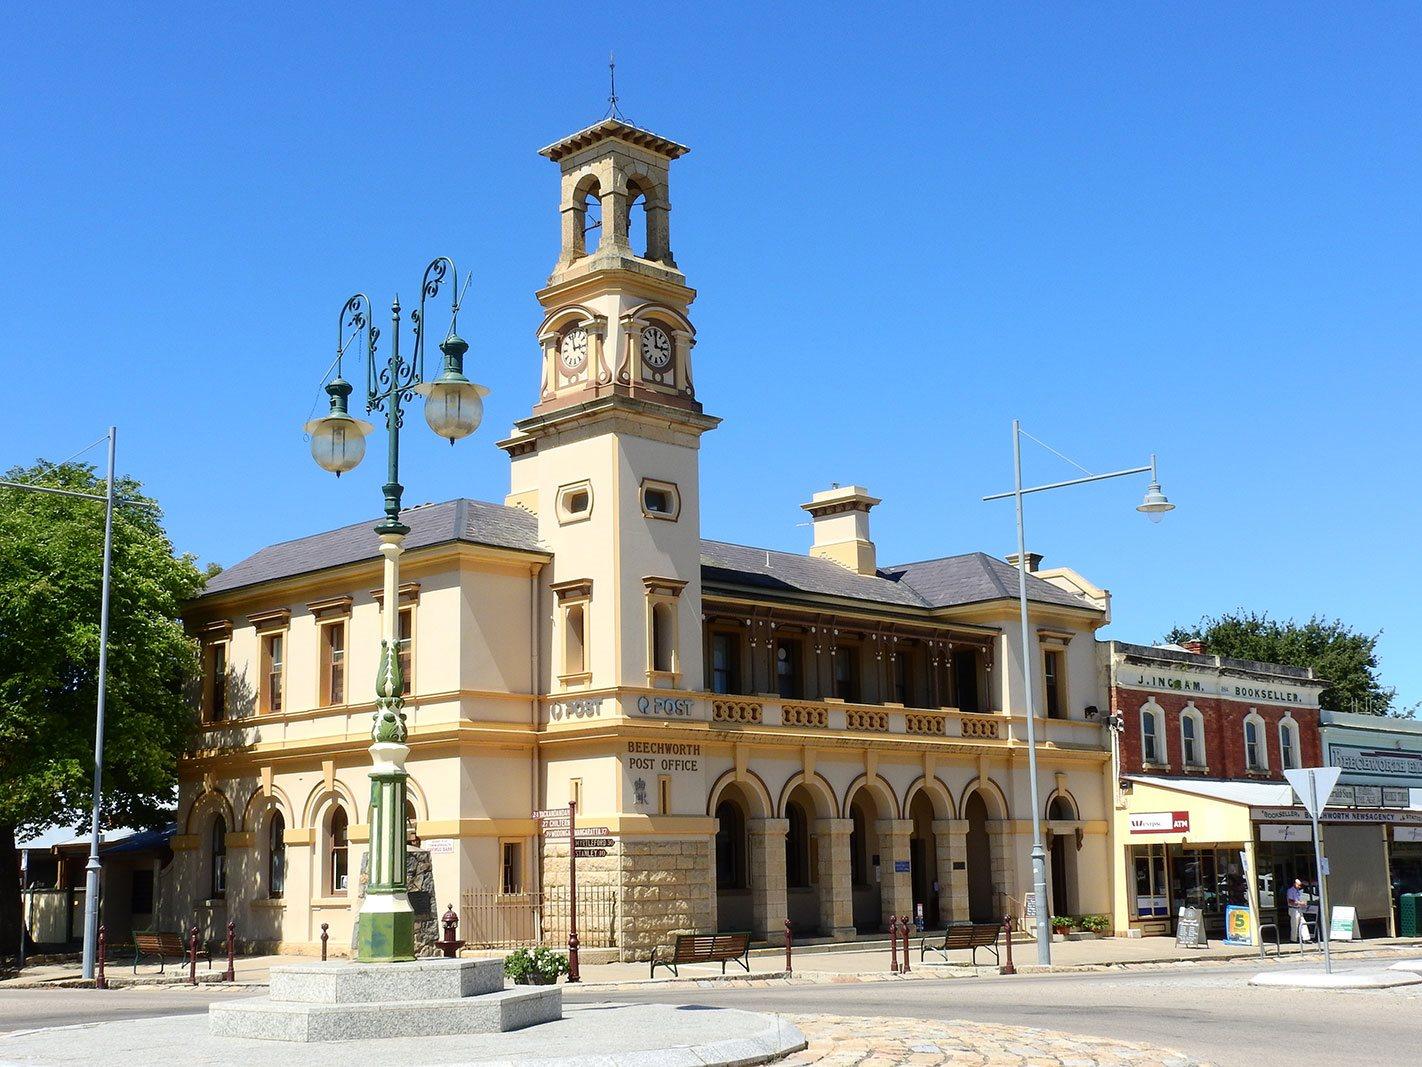 Beechworth Main Street